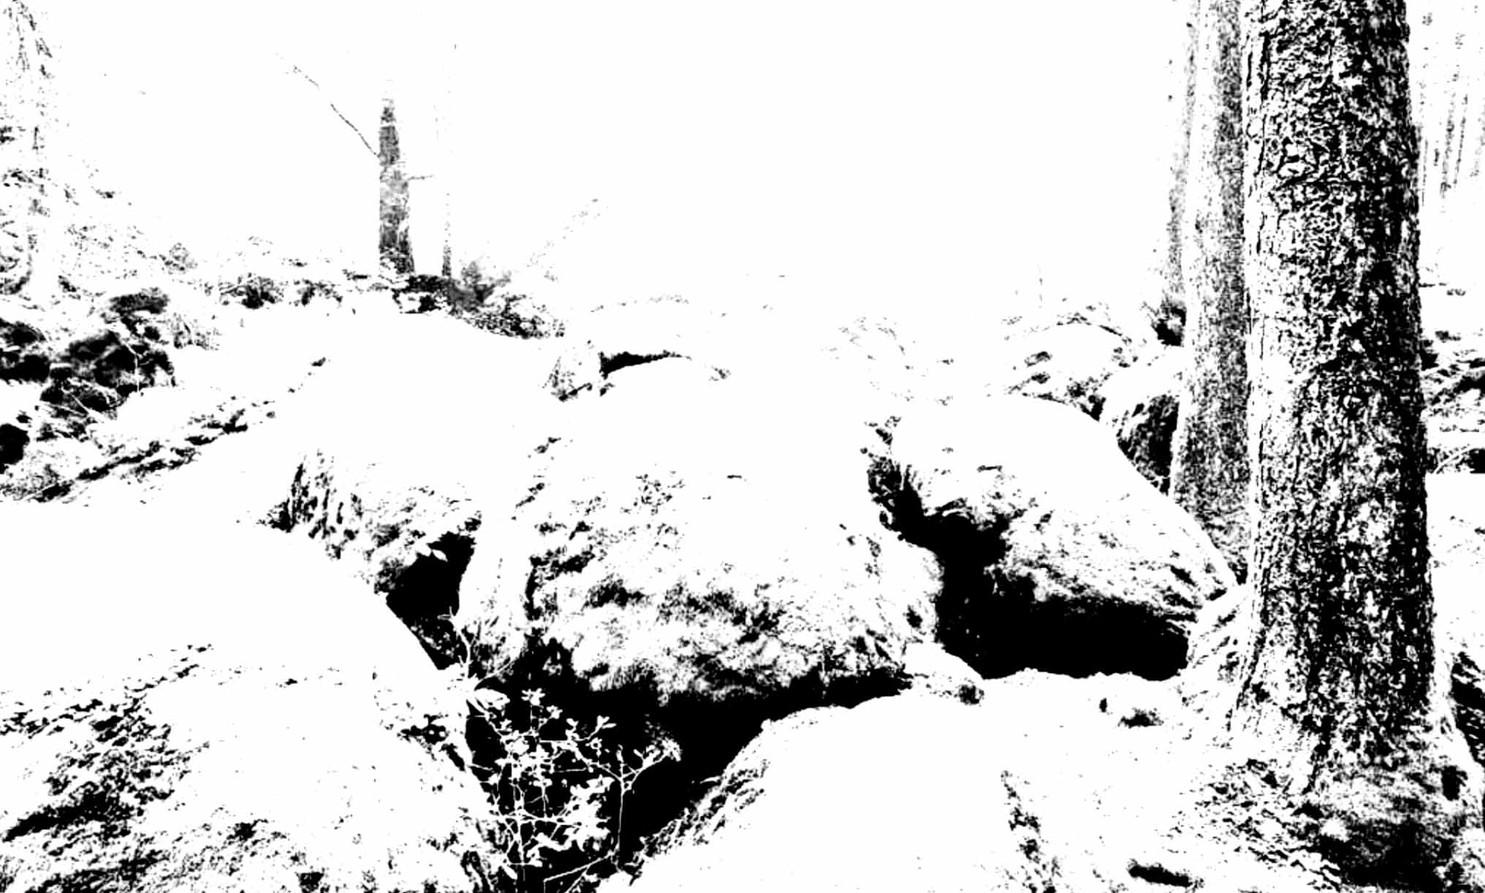 Gerard Lucian Ricard - The Bark of Dreams